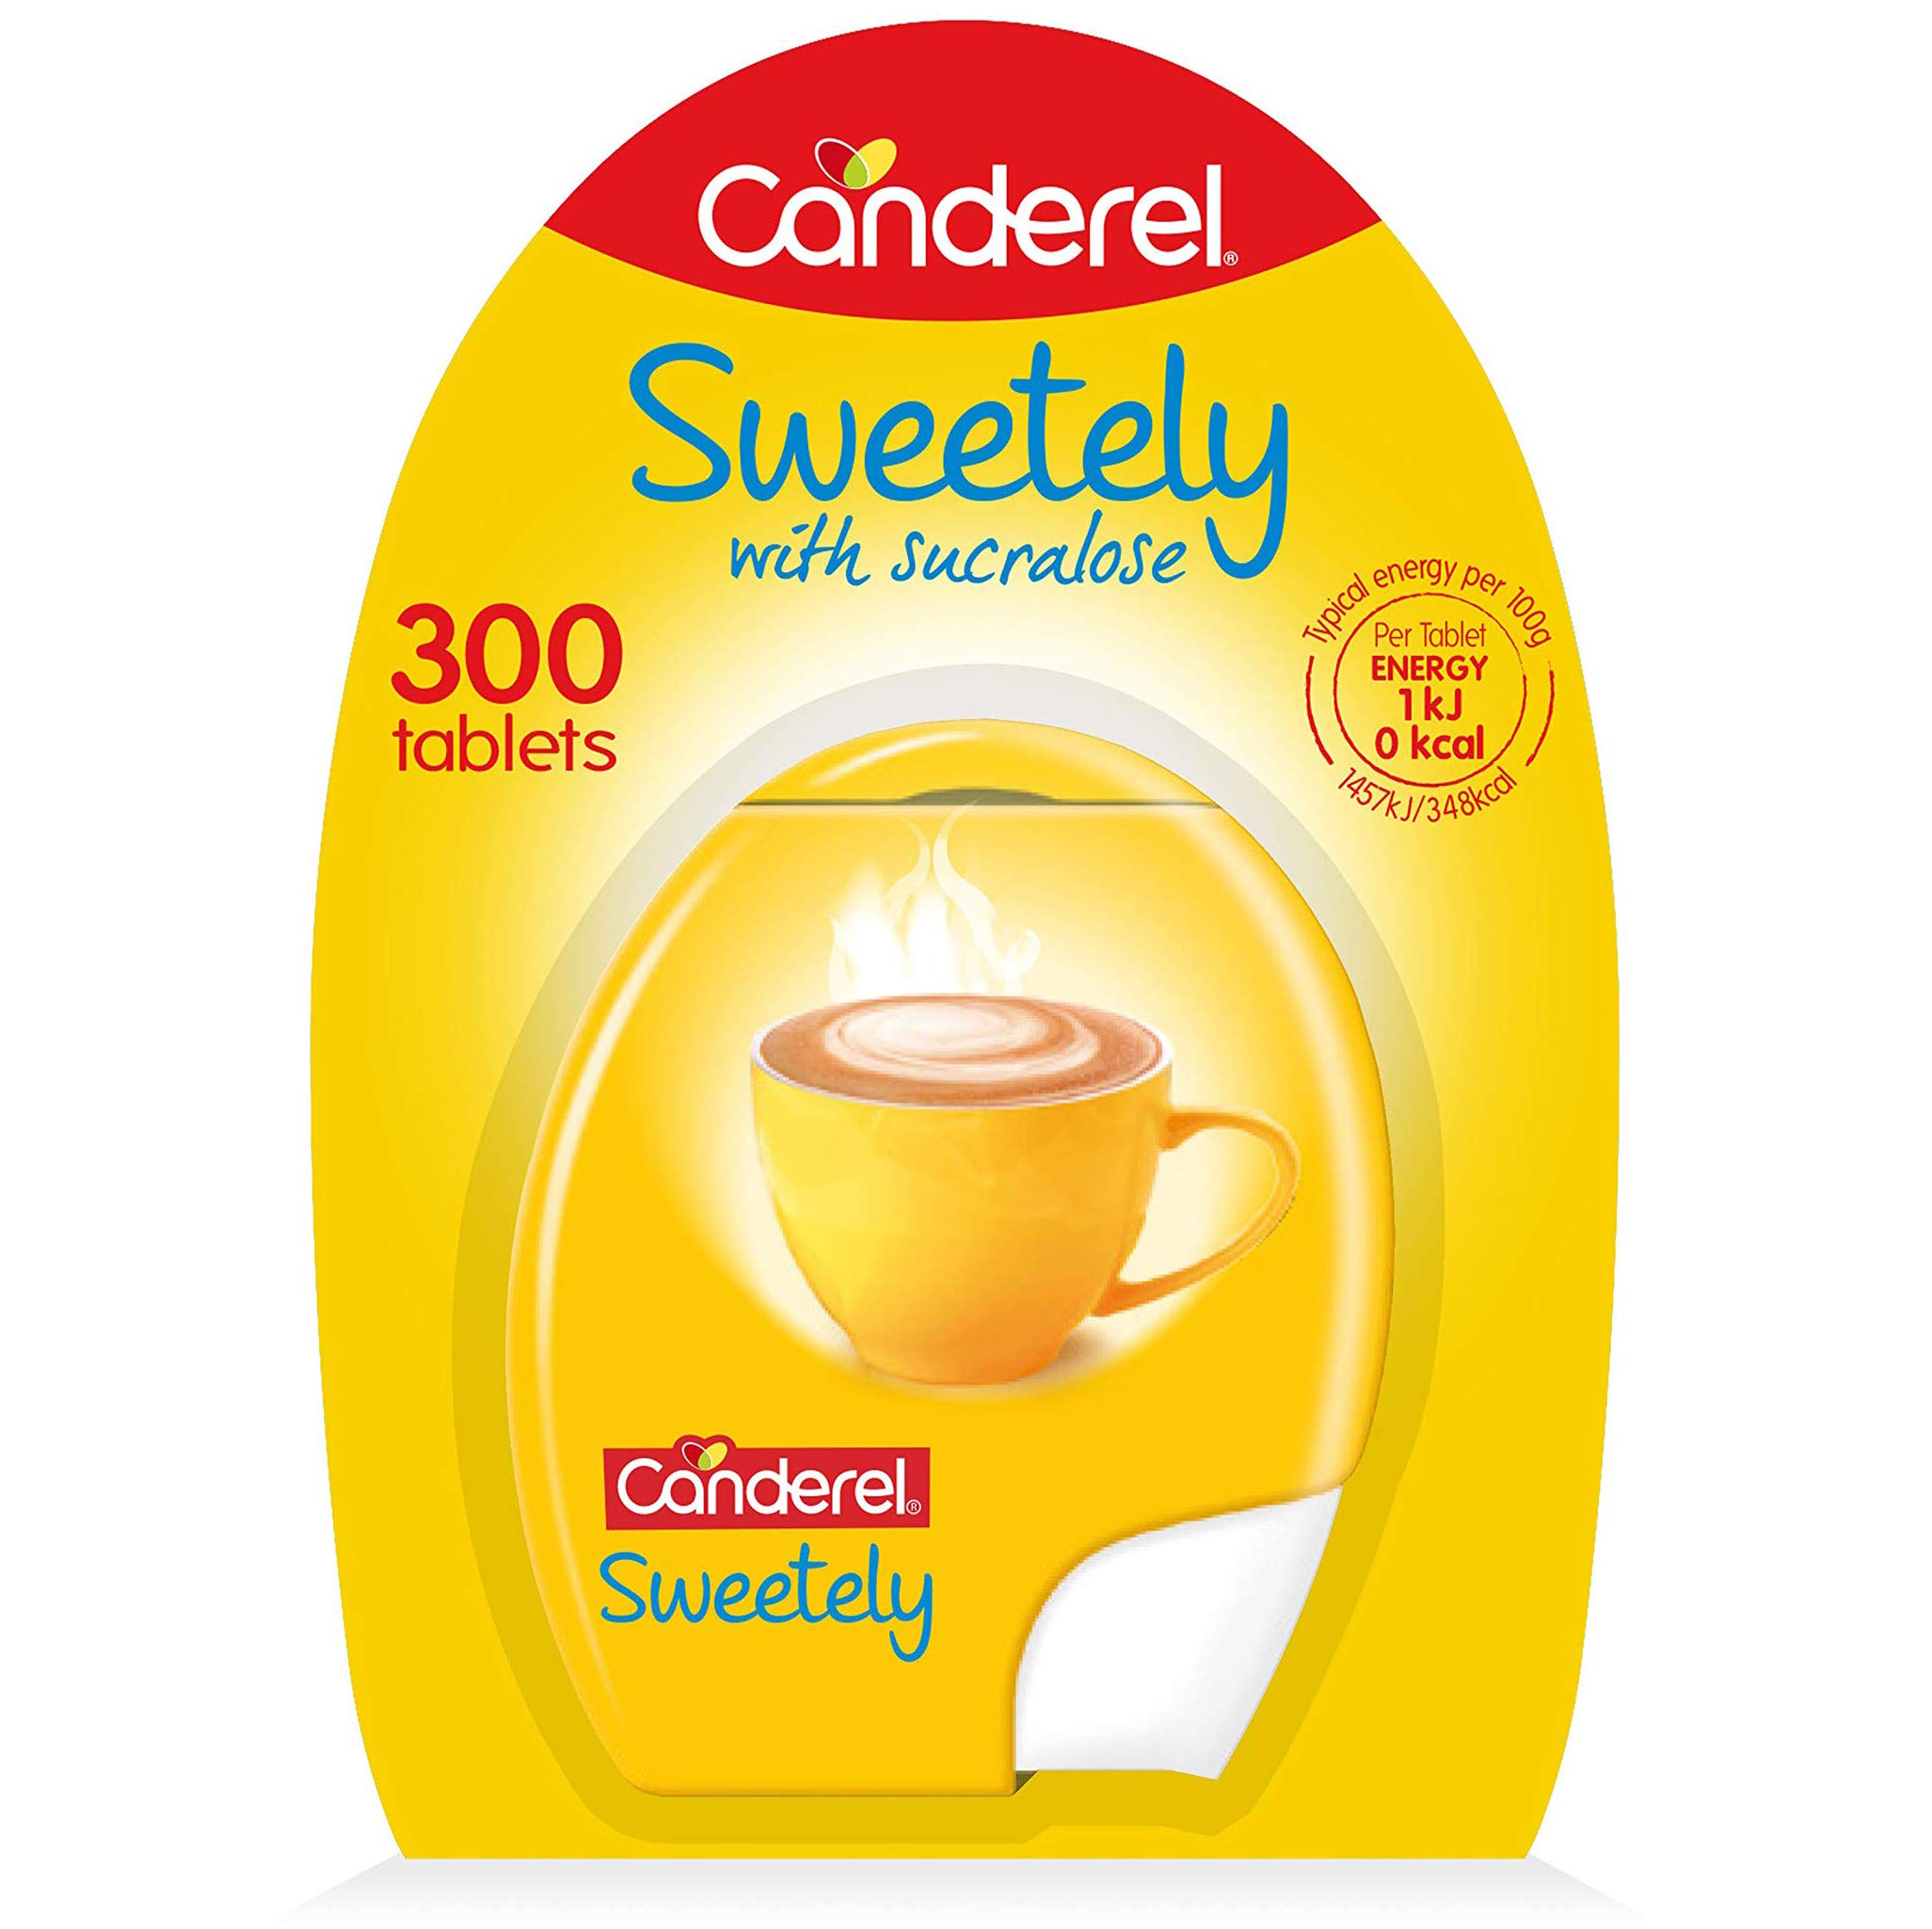 Canderel Sweetely 300 Tablets Dispenser Pack